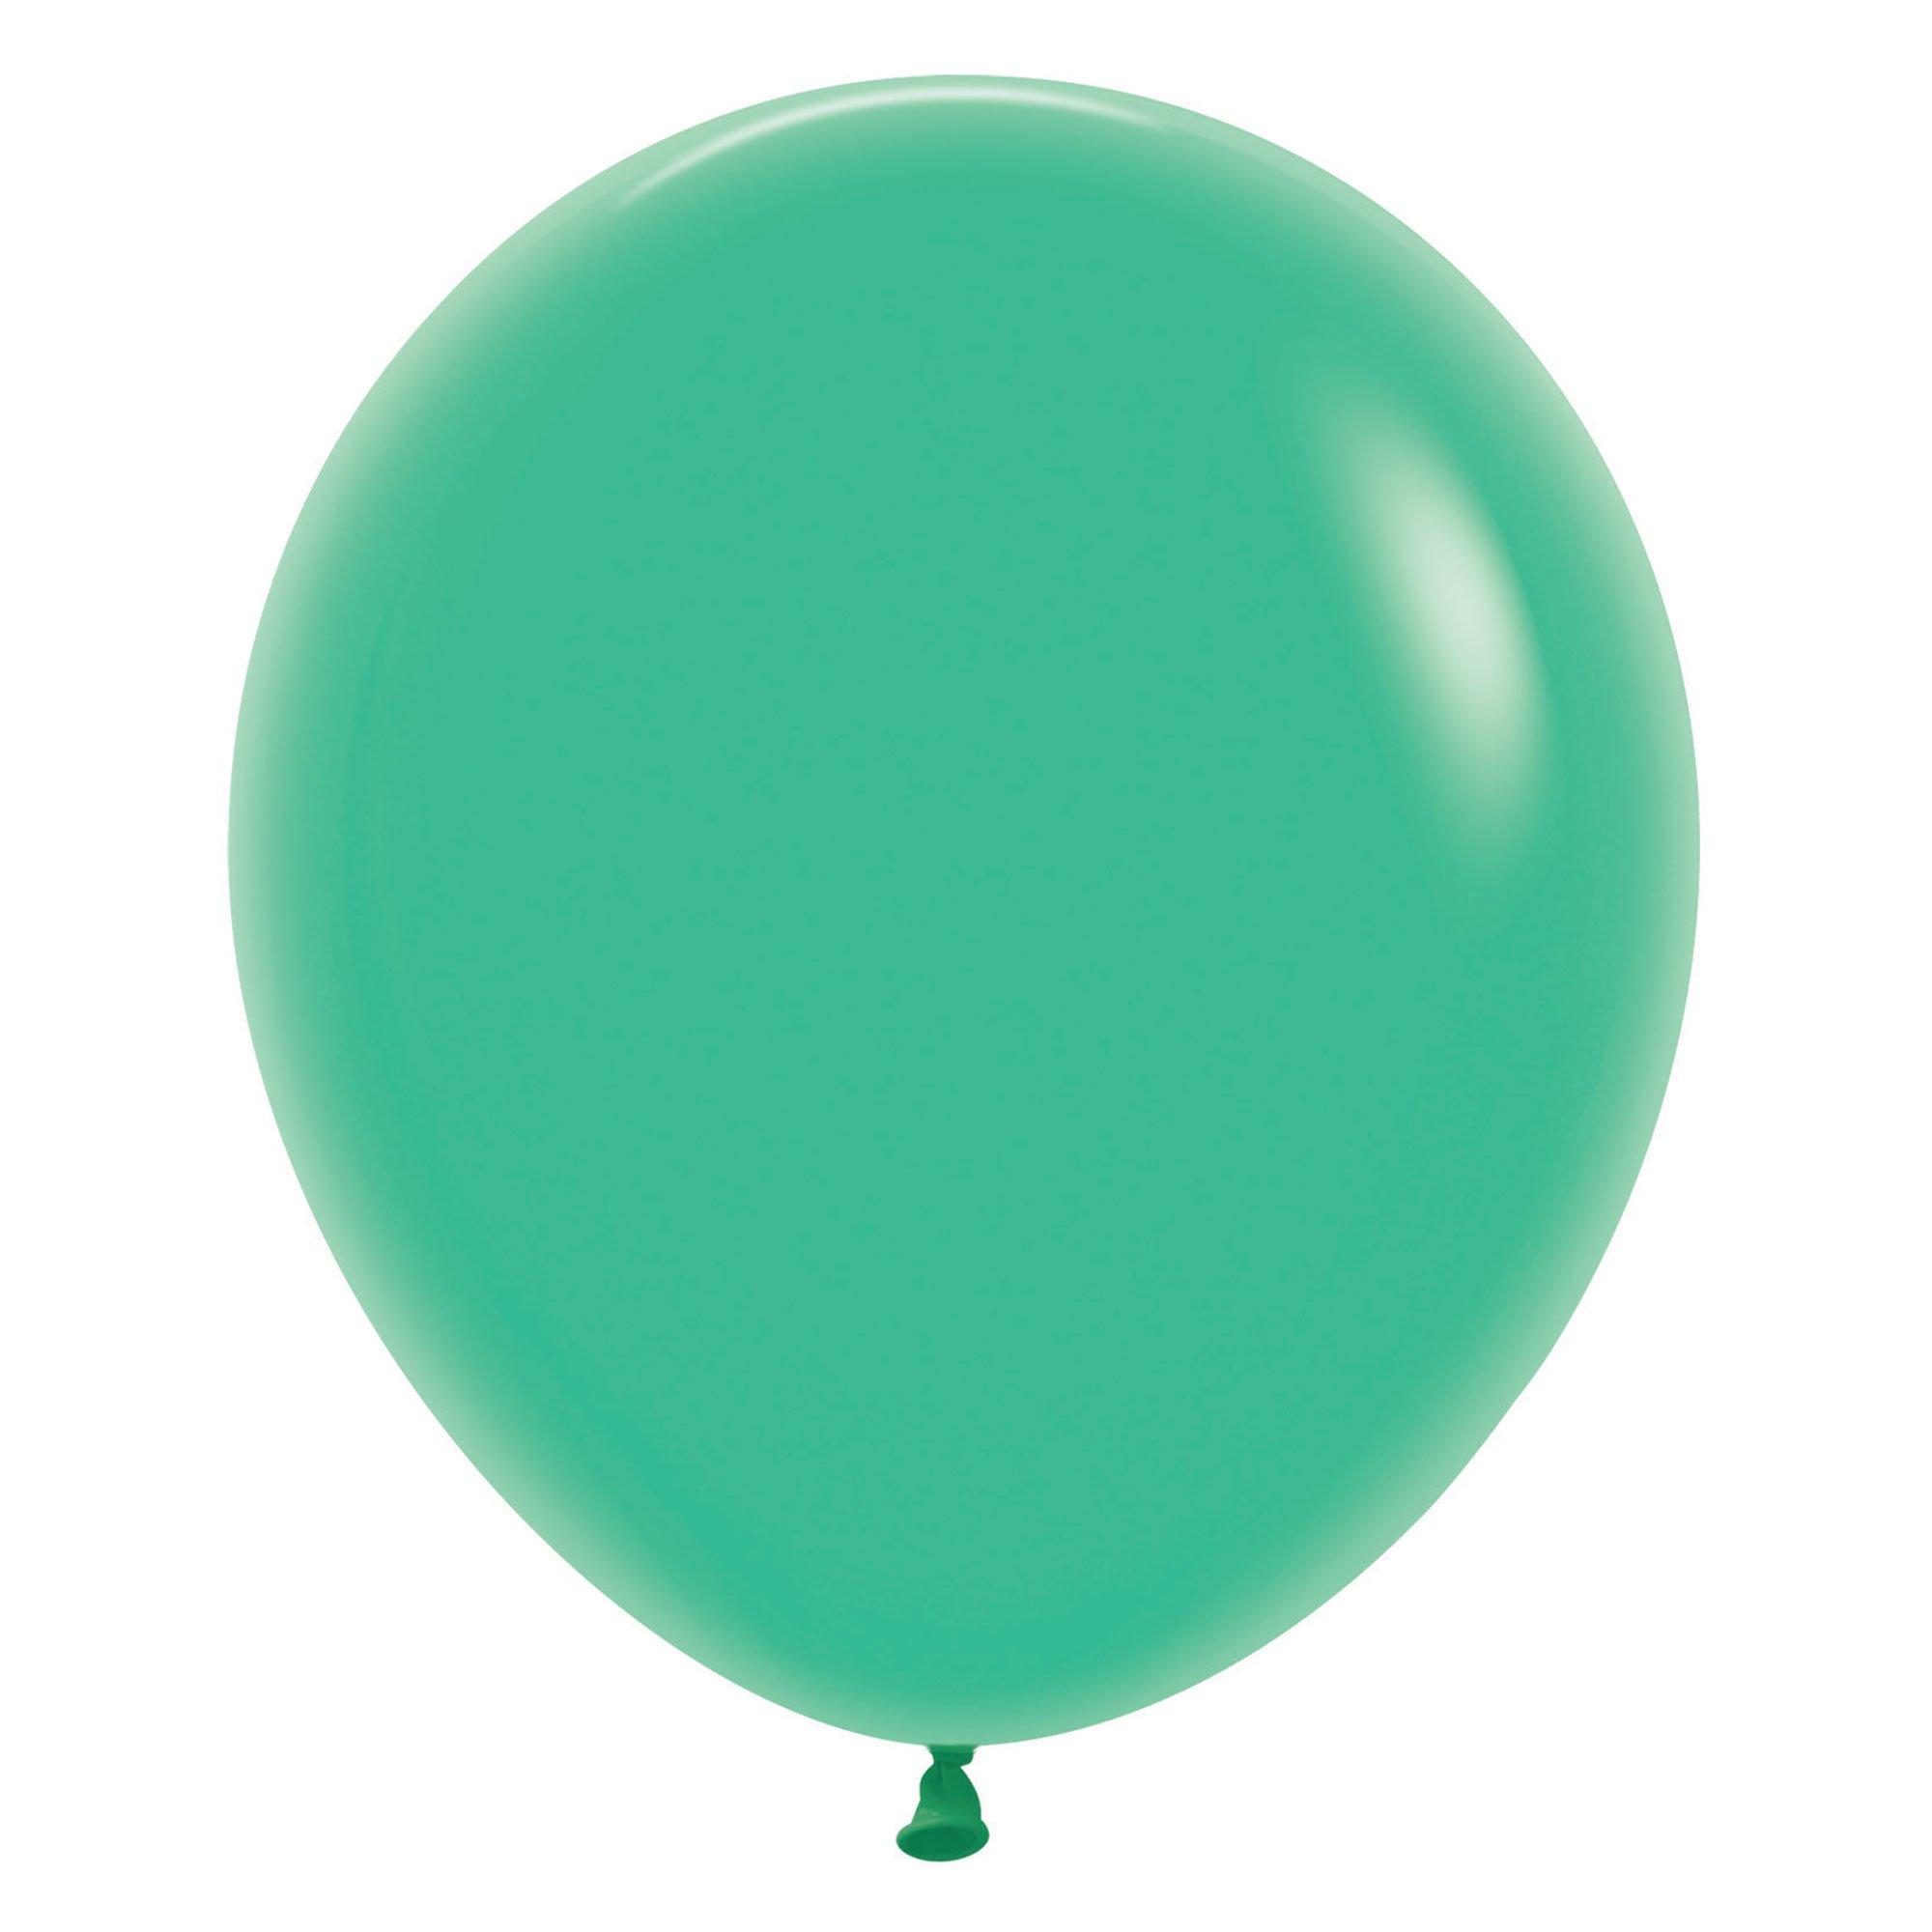 Sempertex 45cm Fashion Green Latex Balloons 030, 6PK